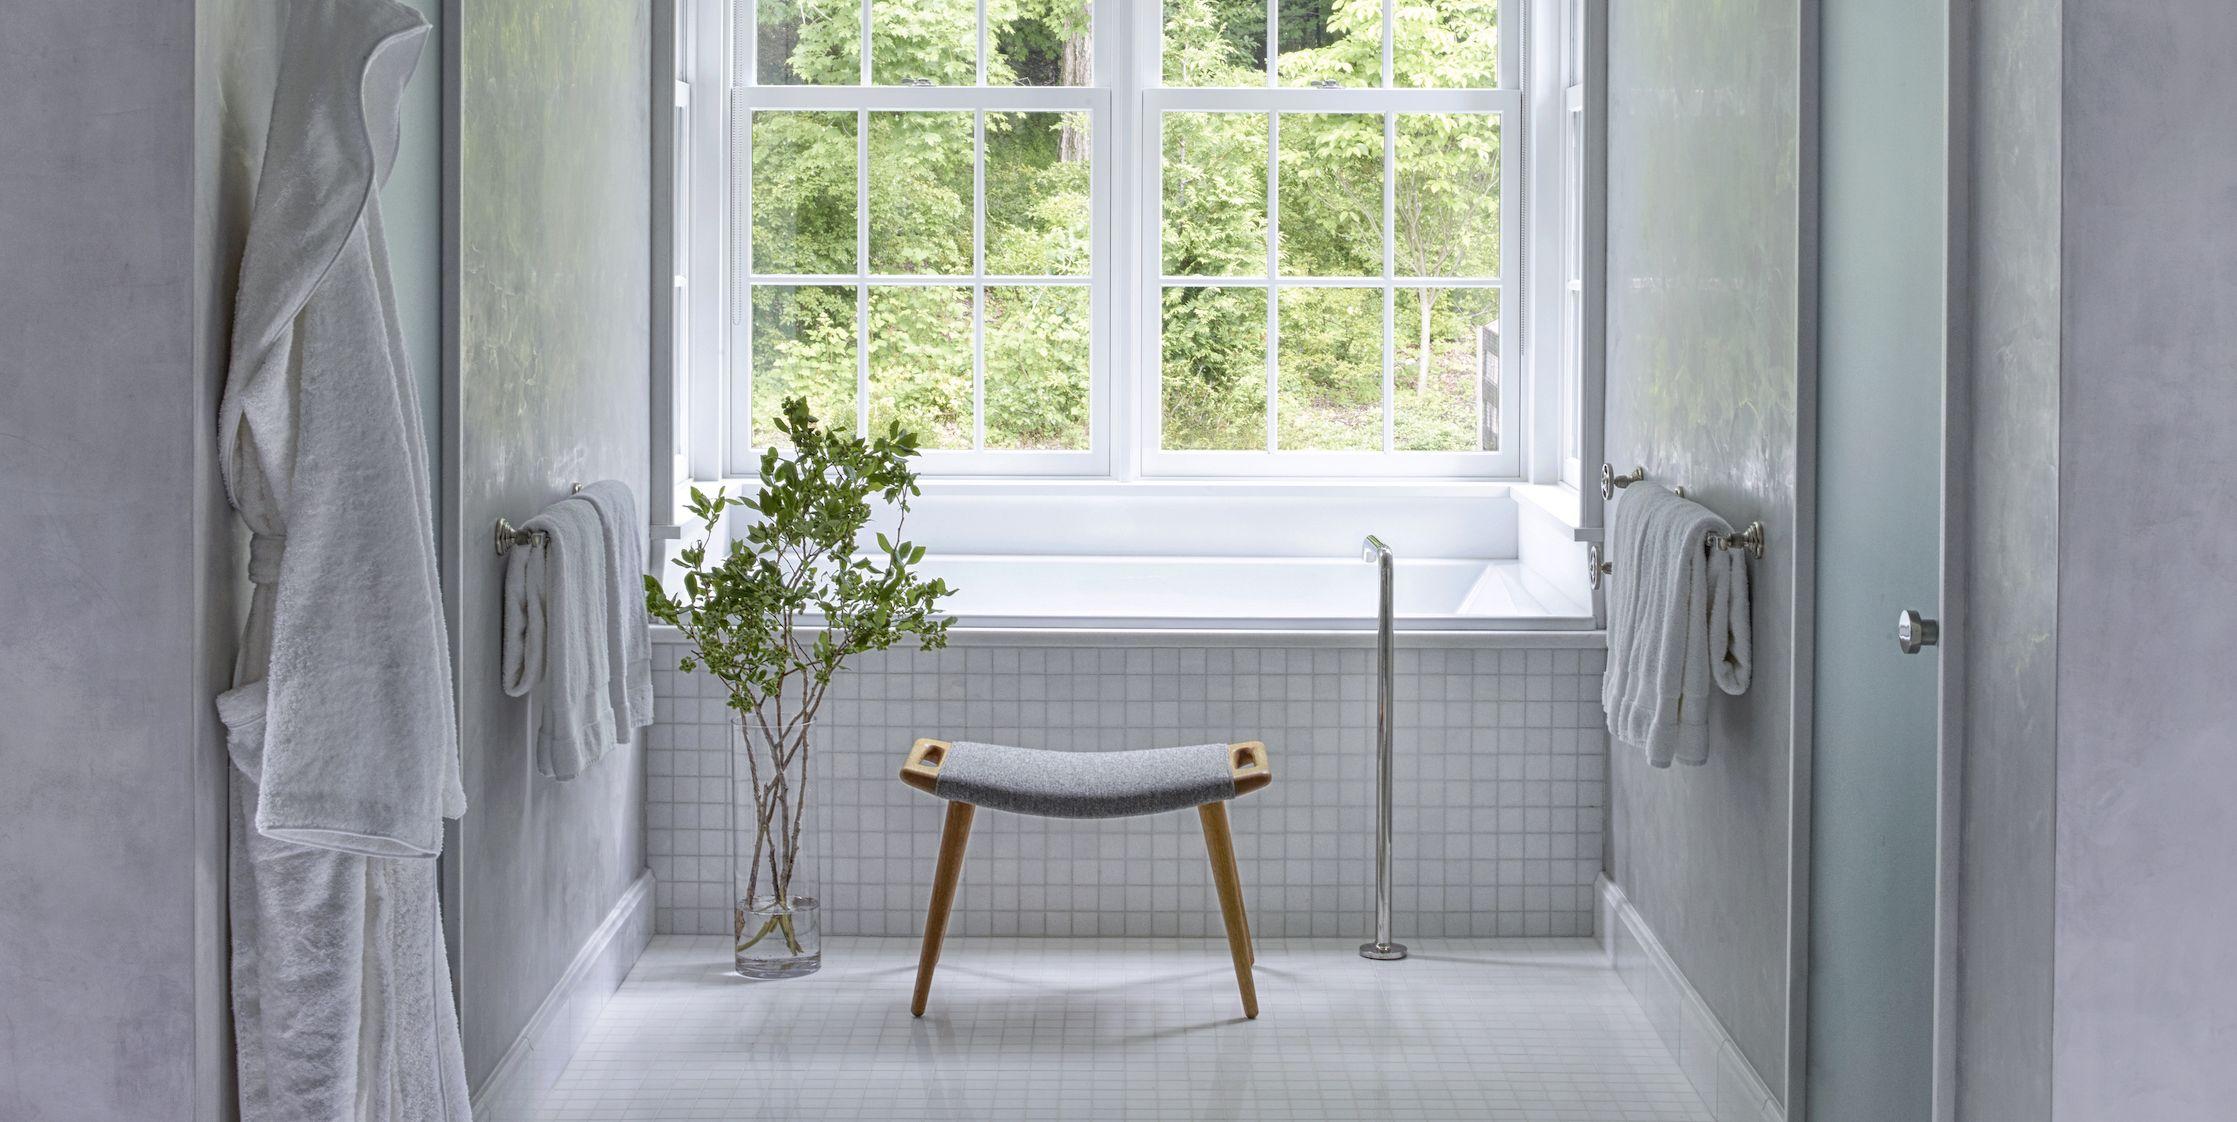 100 Bathroom Ideas Designs Best Bathroom Decorating Elle Decor